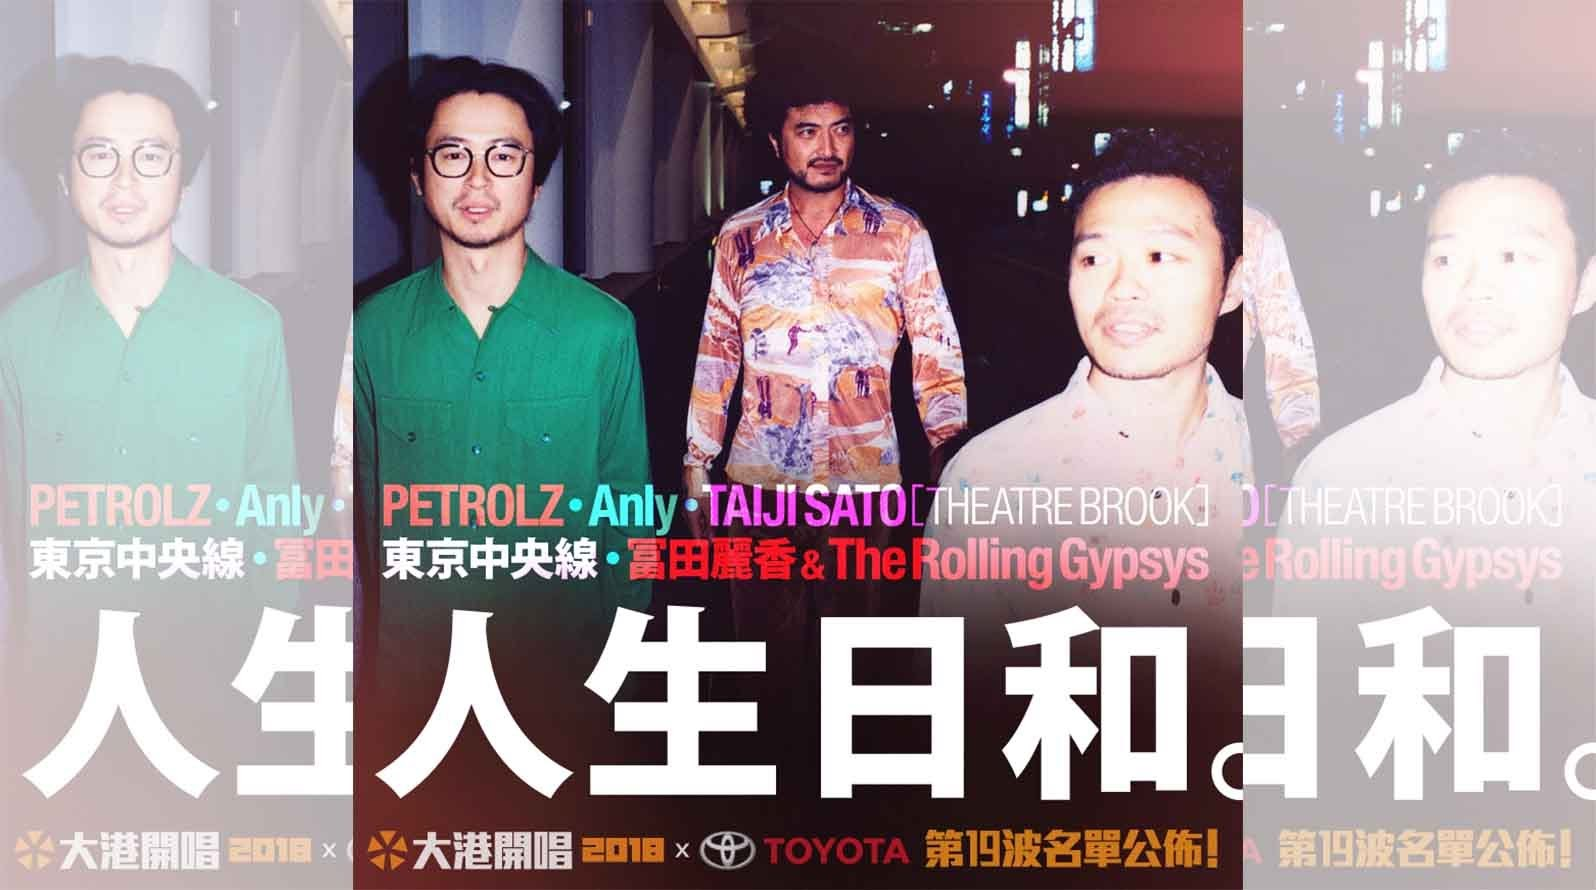 PETROLZ引領眾知名日本音樂人 進擊高雄 第十九波人生日和 溫柔照耀大港港灣